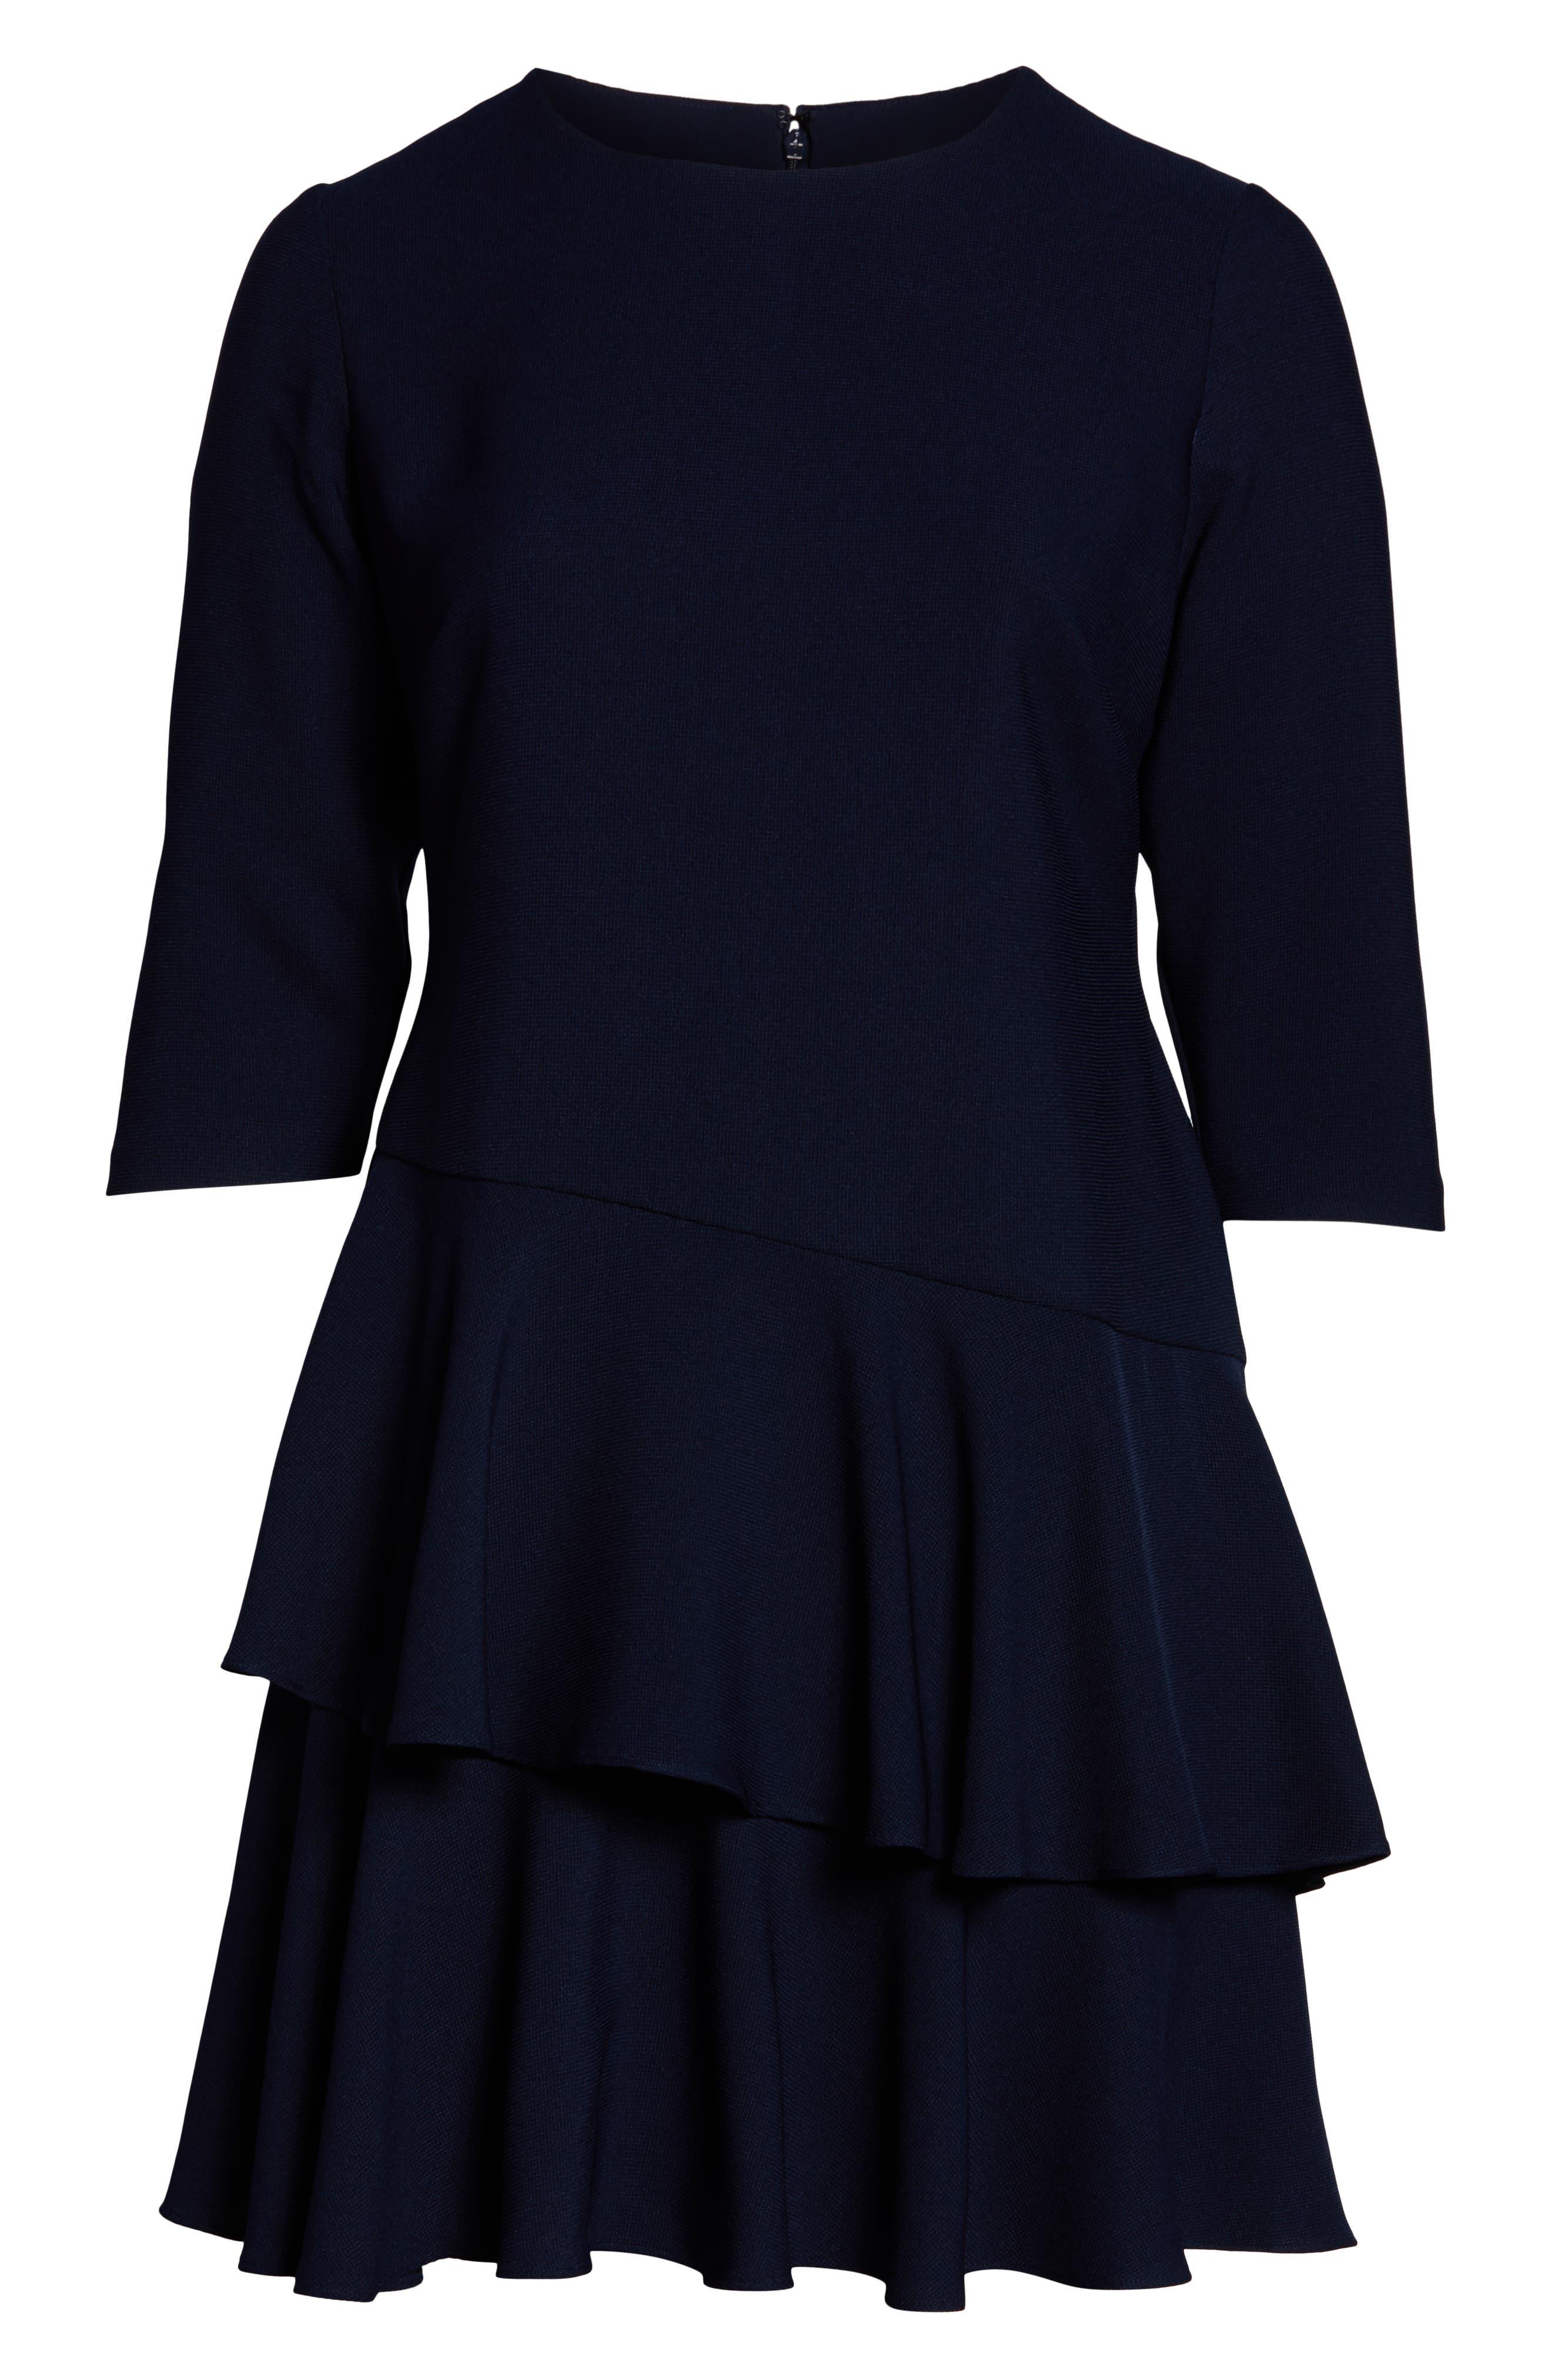 ELIZA J, Ruffle Tiered Sheath Dress, Alternate thumbnail 2, color, NAVY